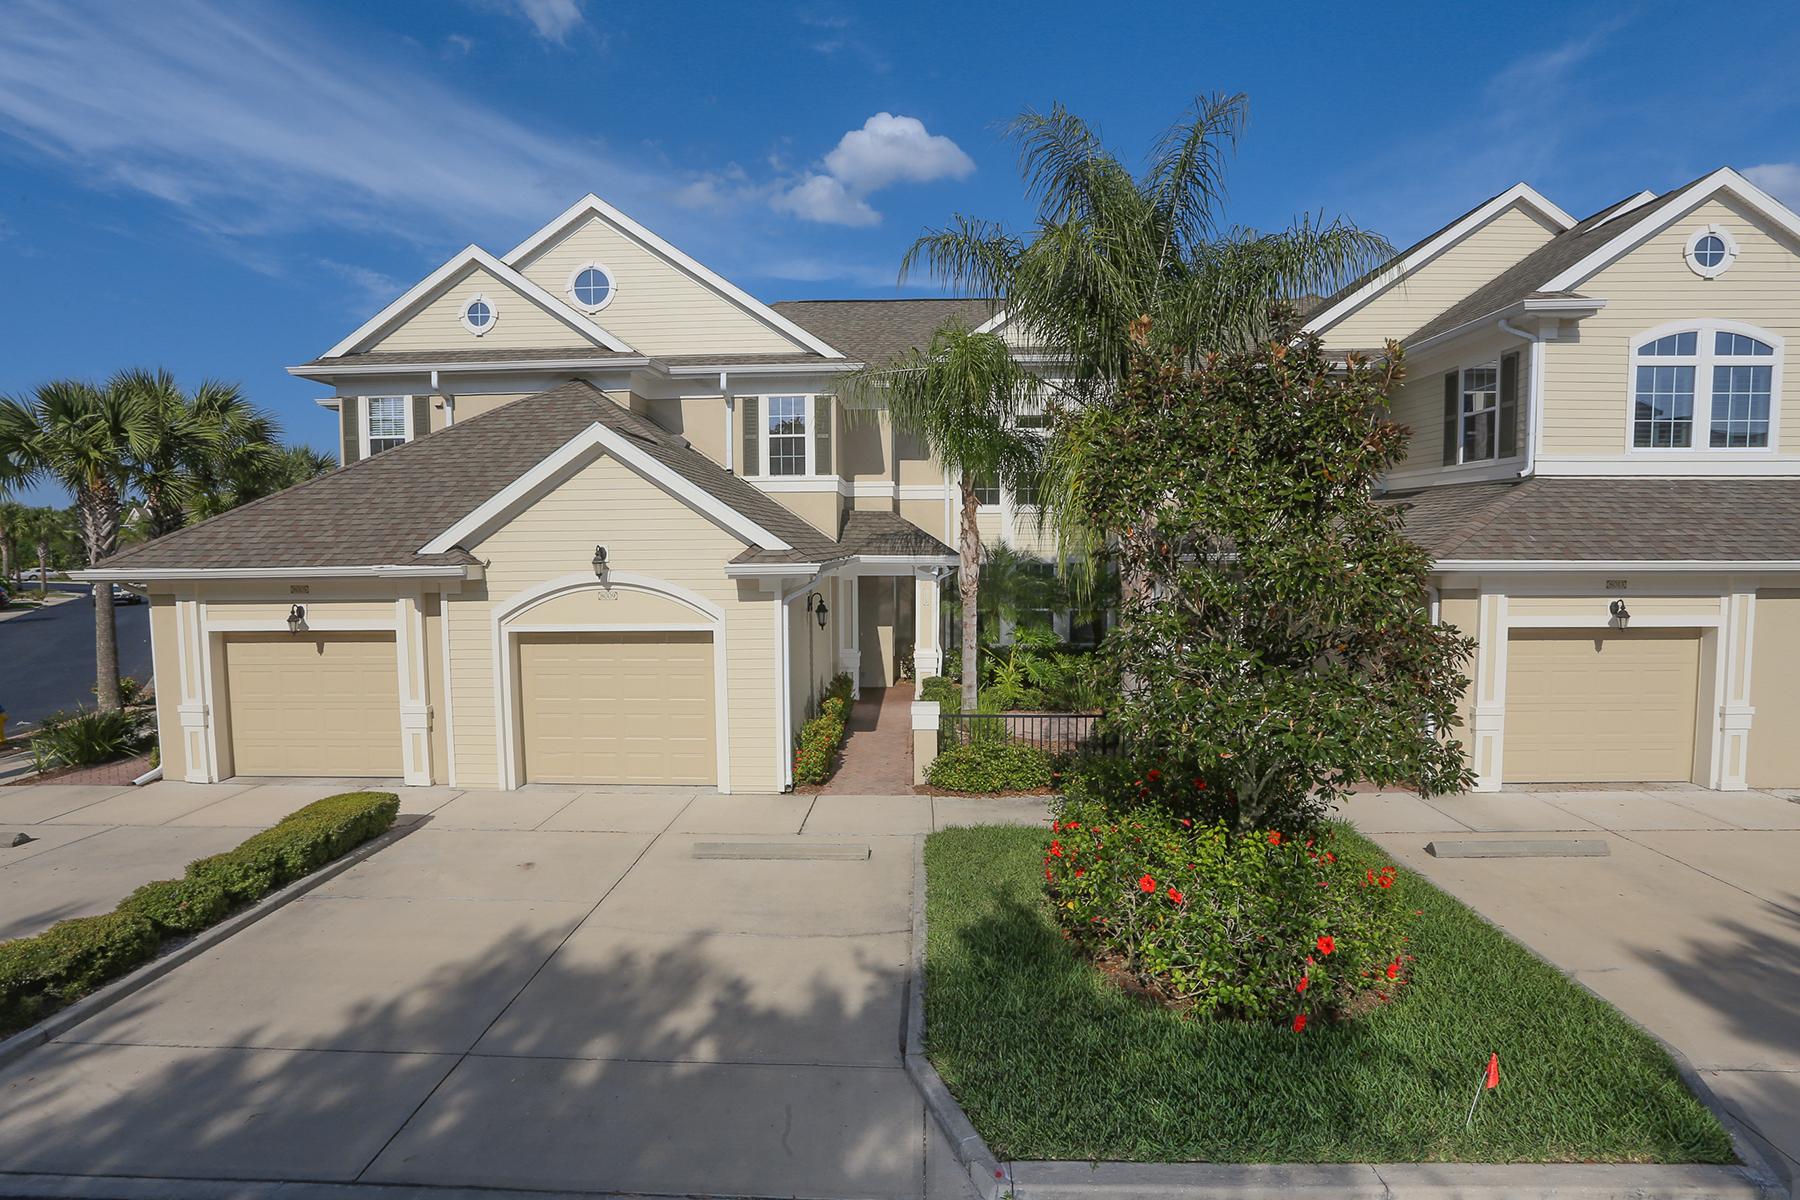 Condominium for Sale at SAVANNAH PRESERVE 8009 Tybee Ct 8009 University Park, Florida 34201 United States